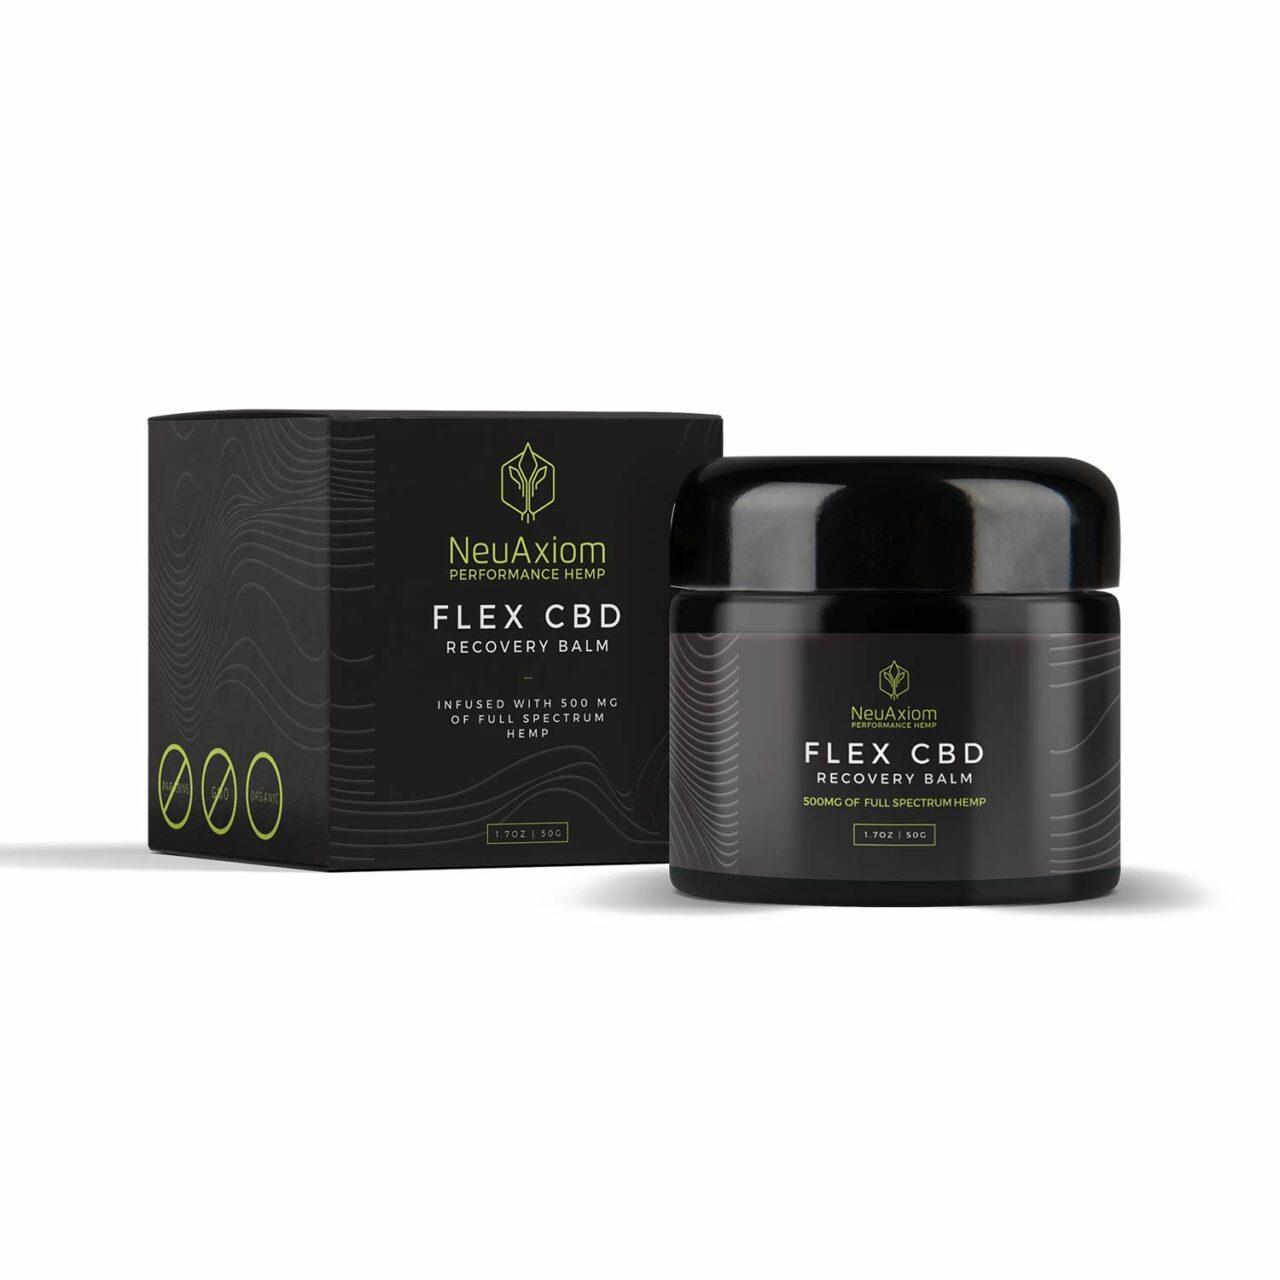 neuaxiom-flex-cbd-recovery-balm-1-7oz-500mg-of-cbd